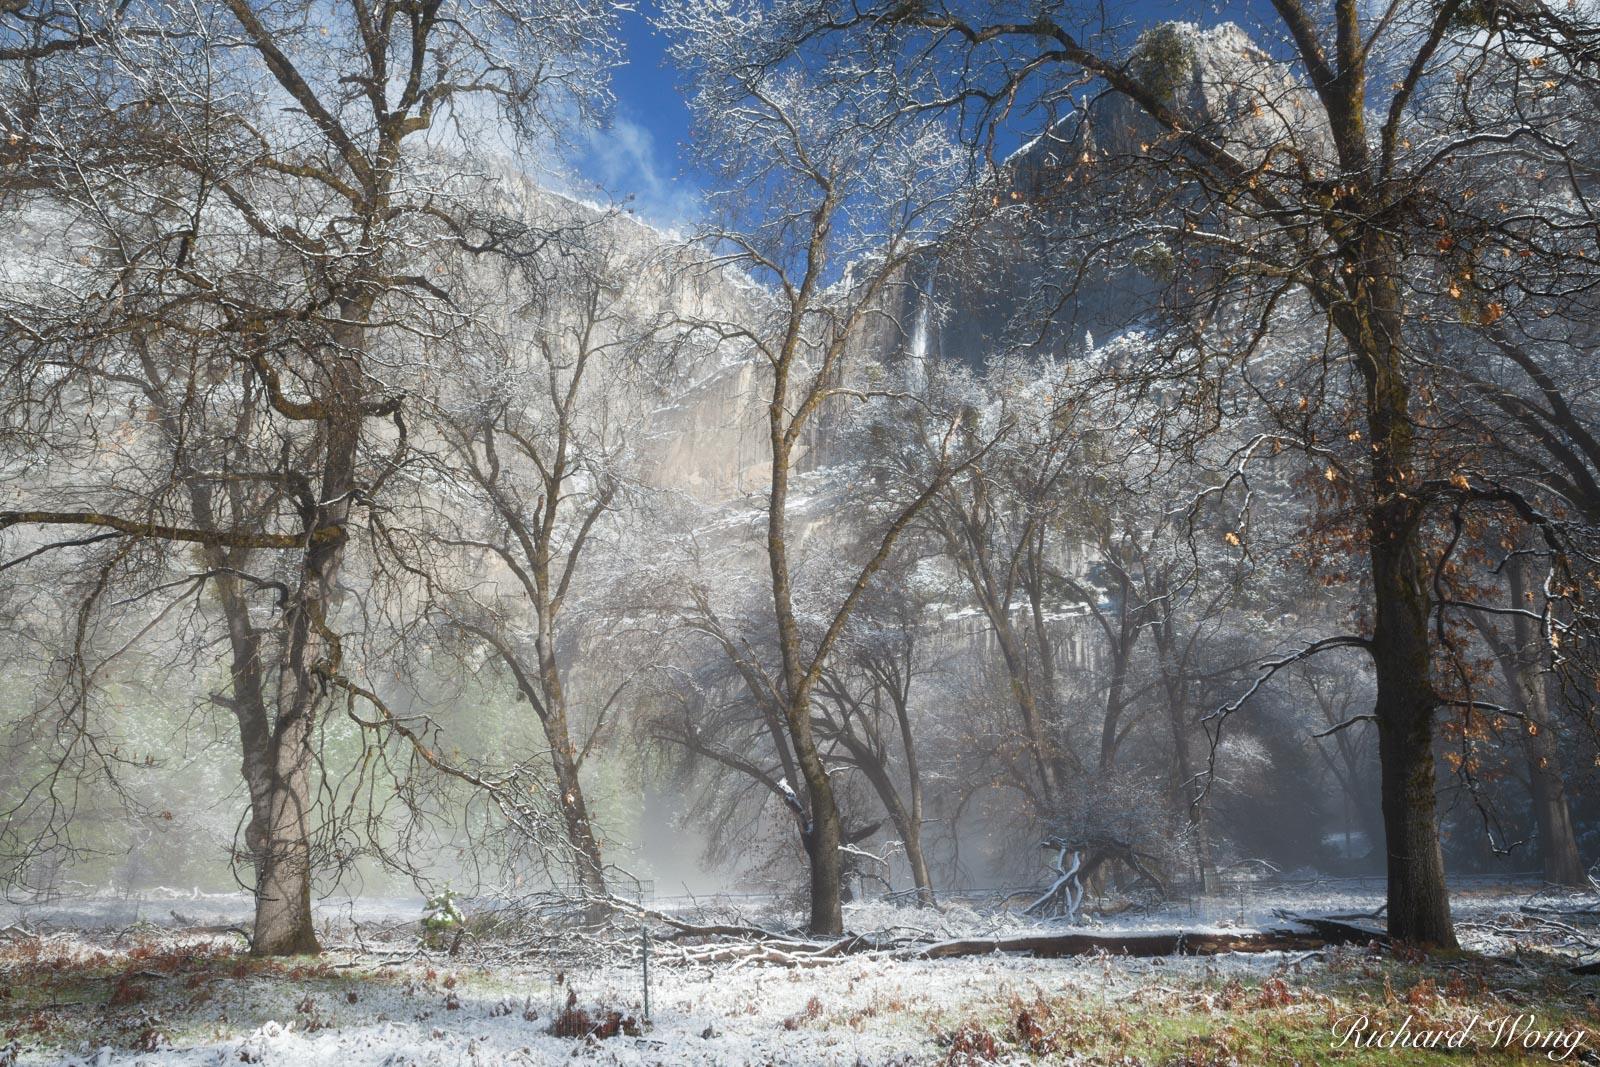 Yosemite Falls After Spring Snowstorm, Yosemite National Park, California